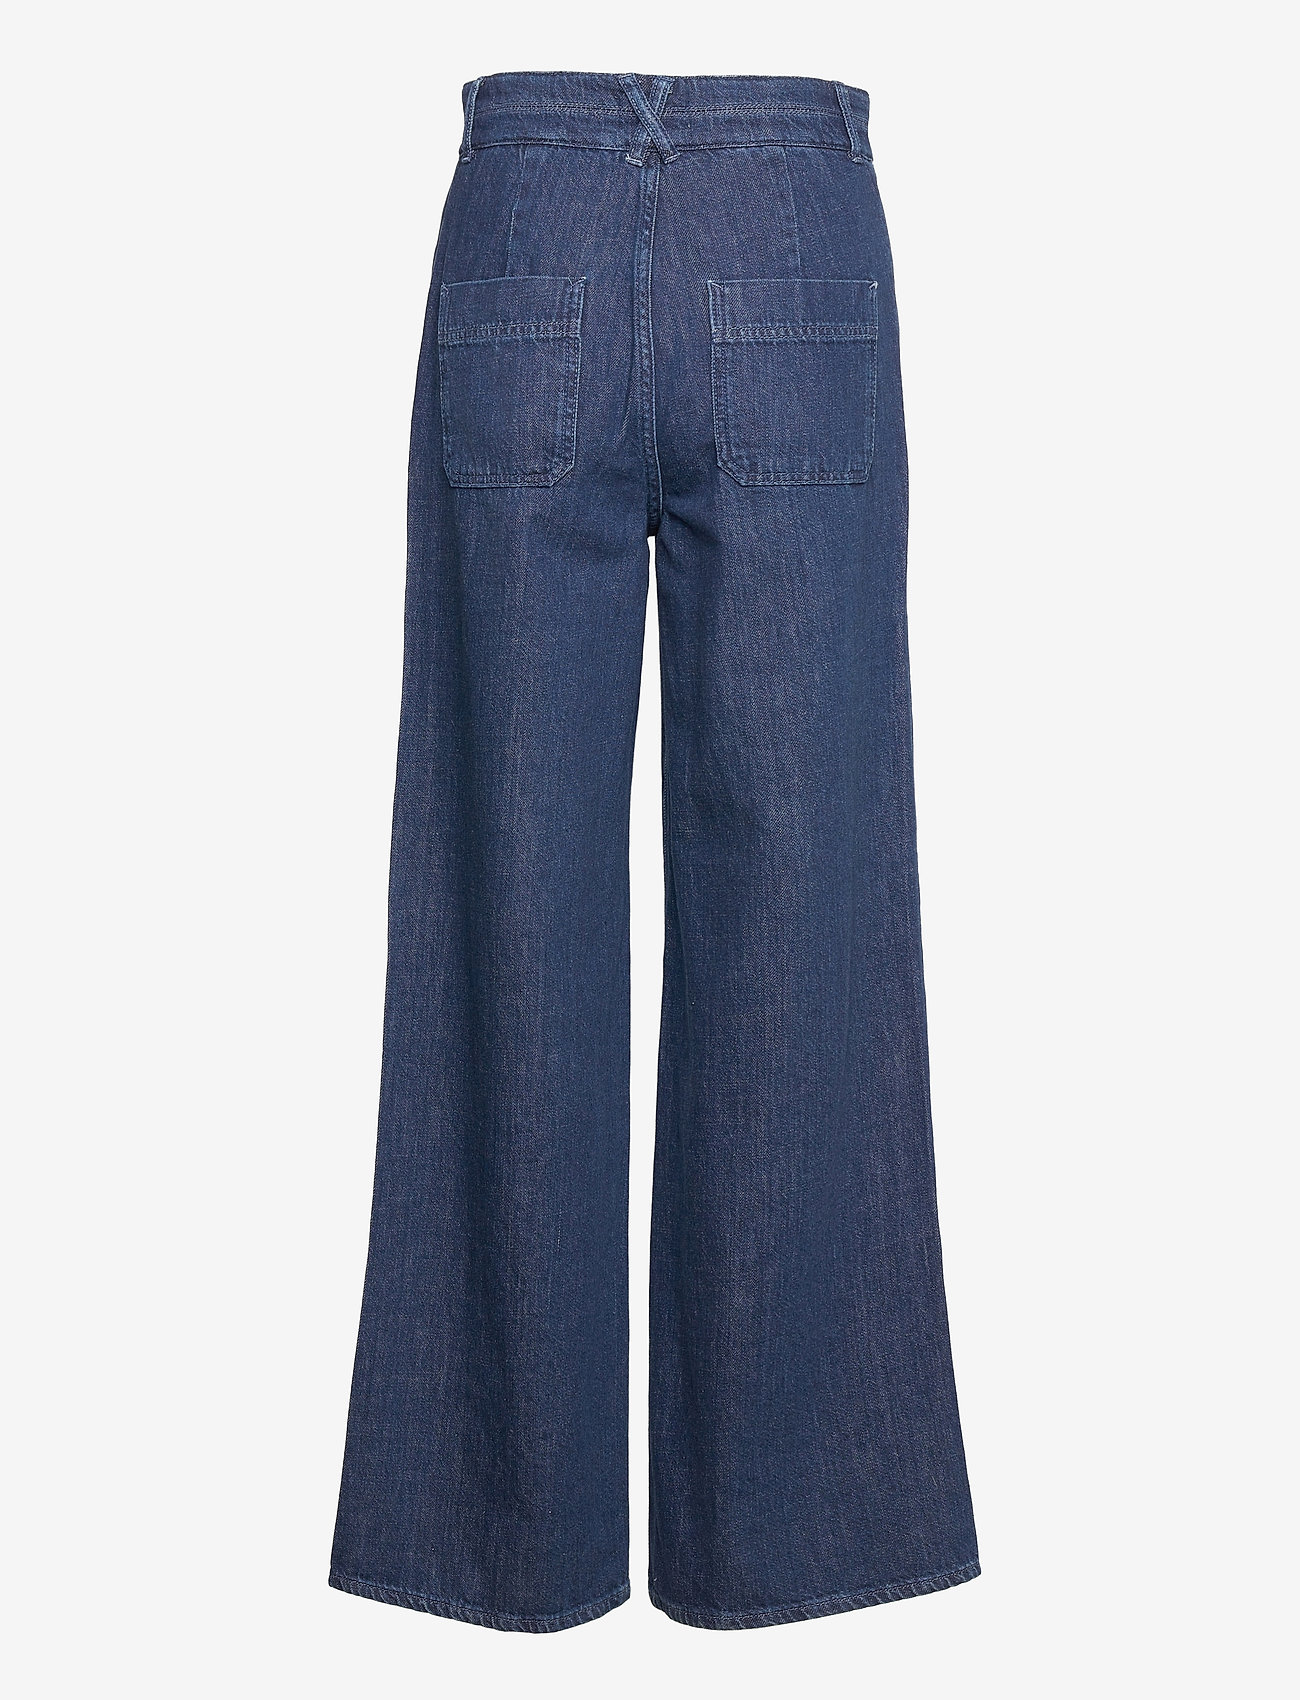 Noa Noa - Trousers - bukser med brede ben - denim dark blue - 1